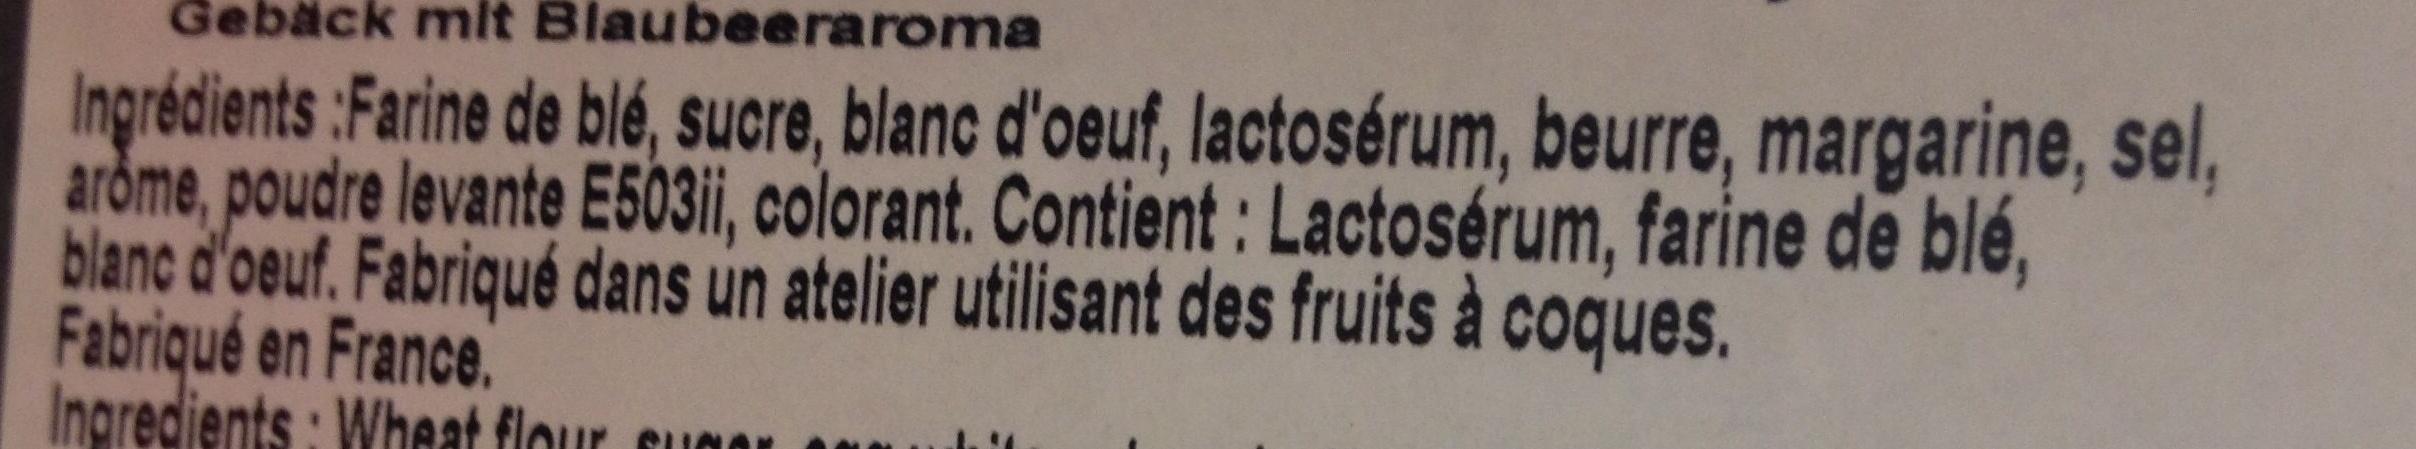 Biscuits saveur myrtille - Ingrédients